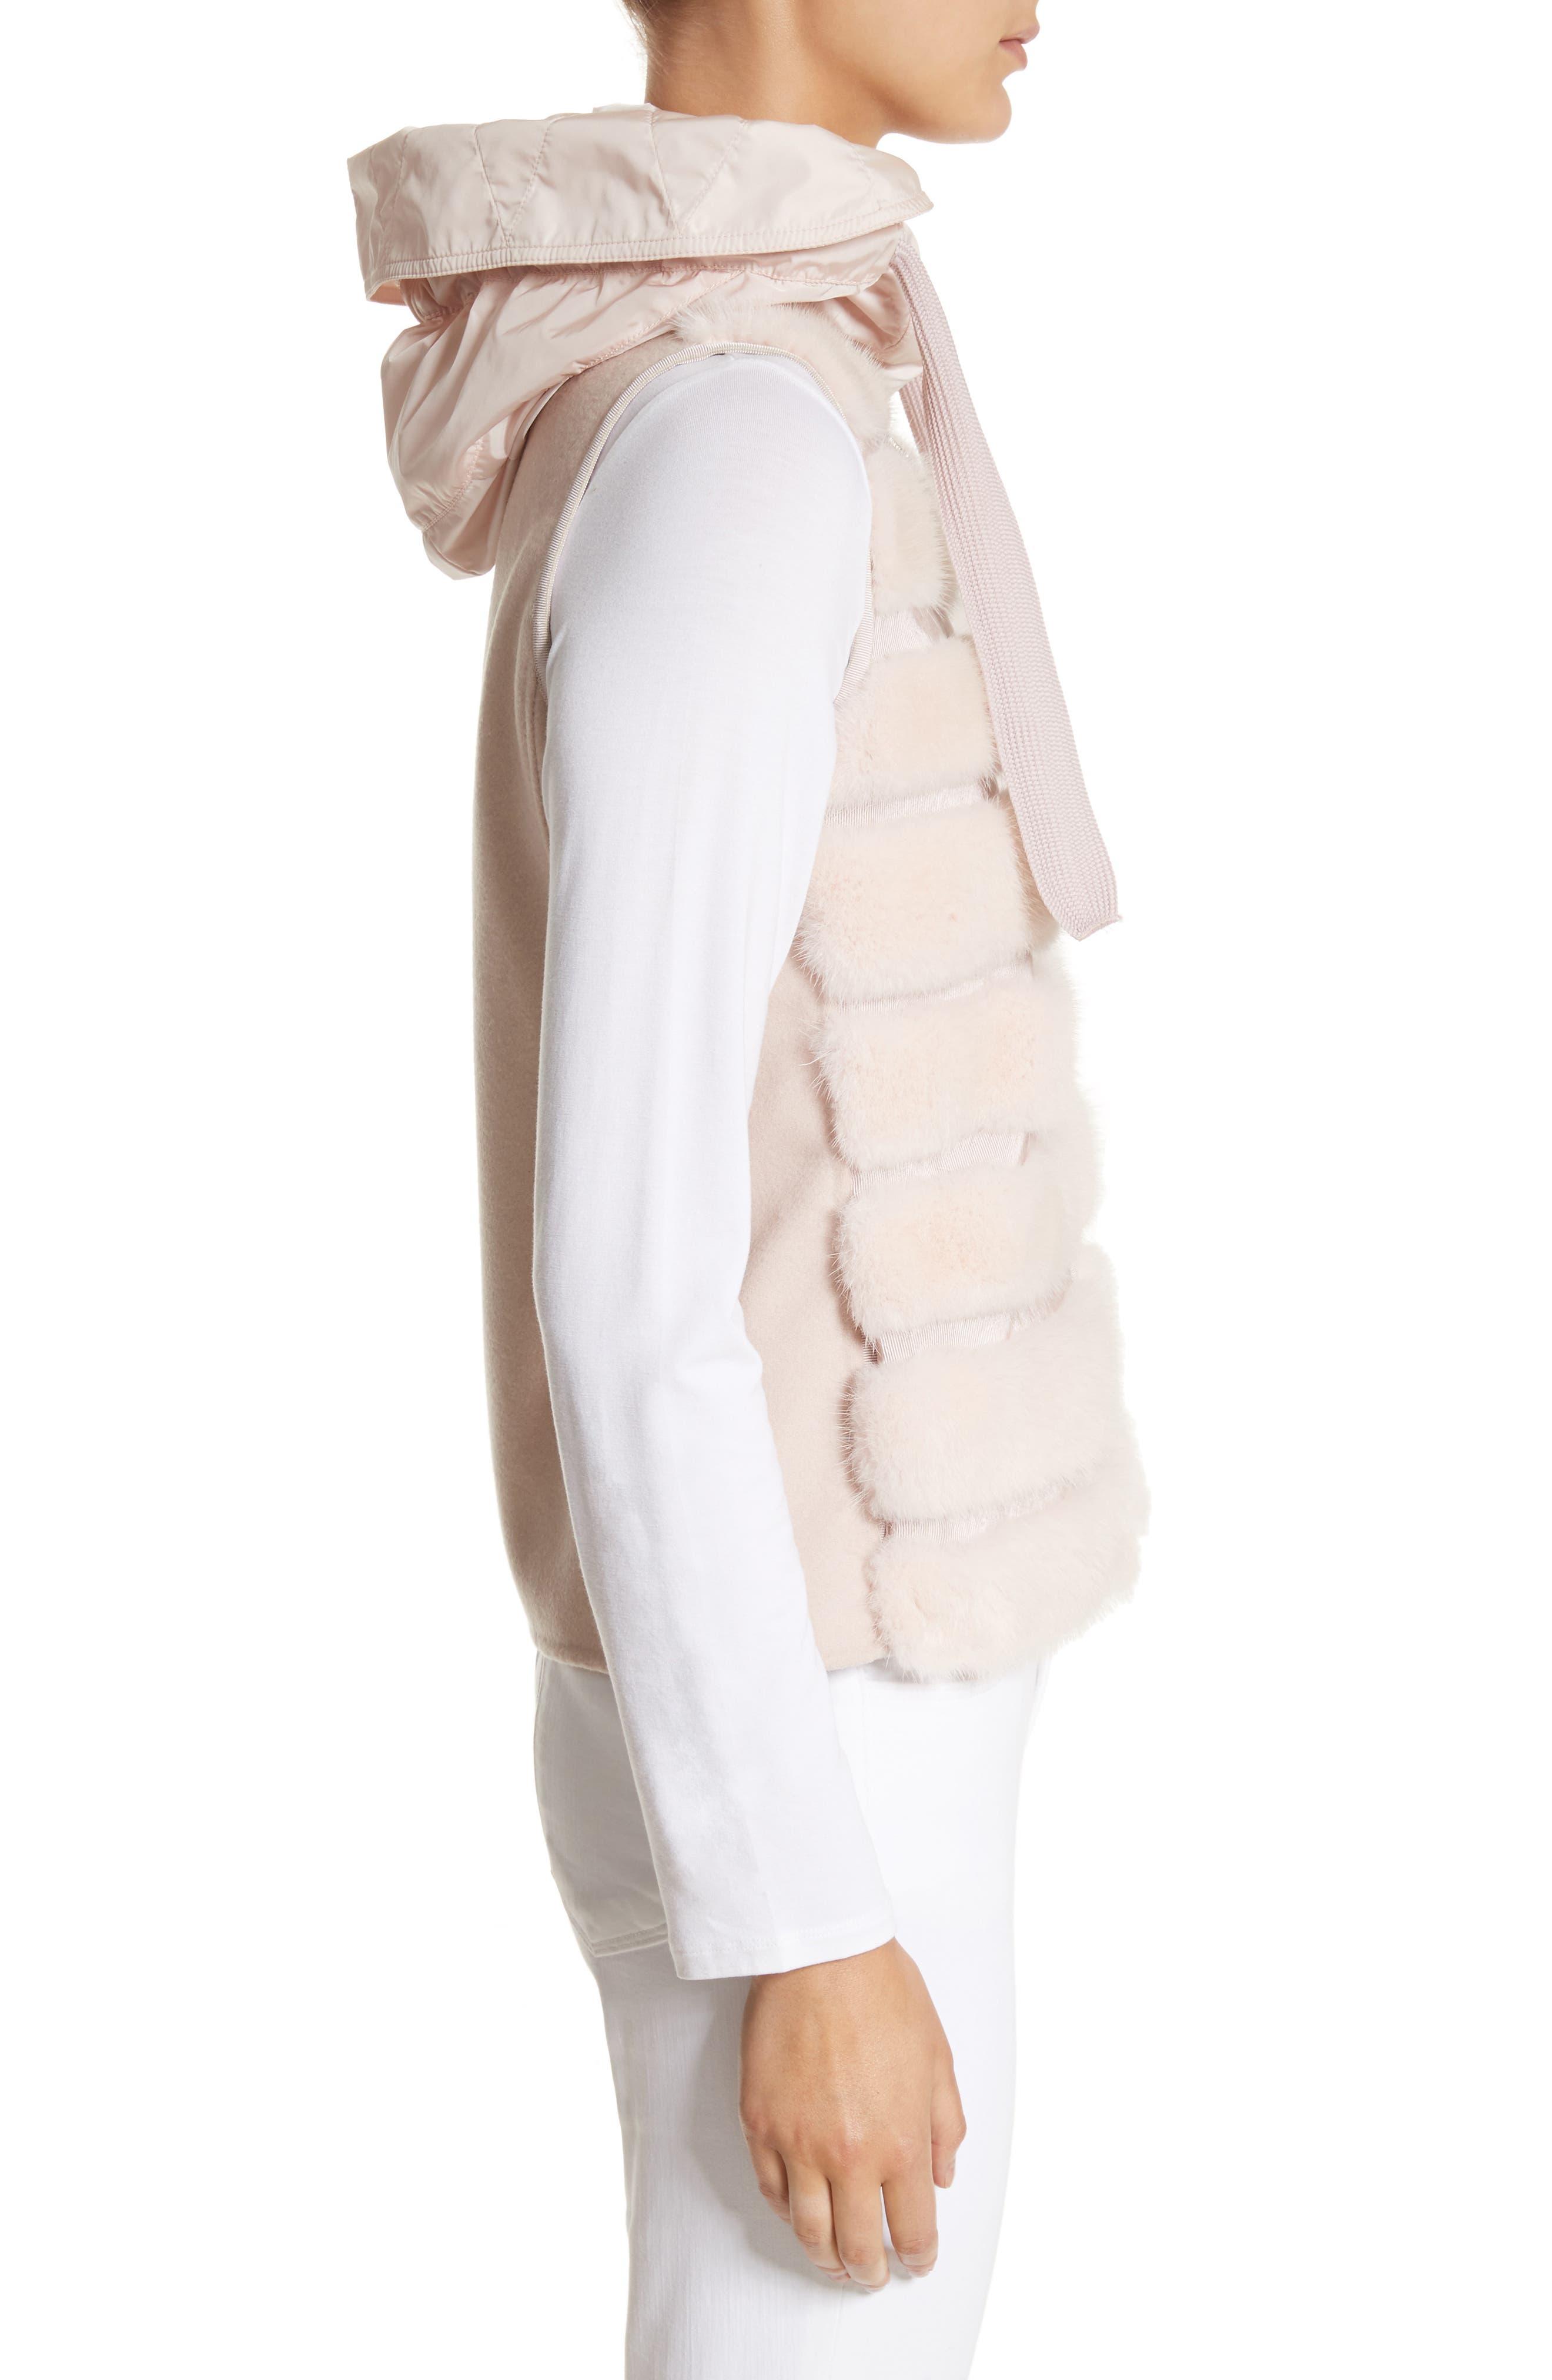 Ametrine Wool & Cashmere Vest with Genuine Mink Fur Trim & Removable Hood,                             Alternate thumbnail 3, color,                             Blush